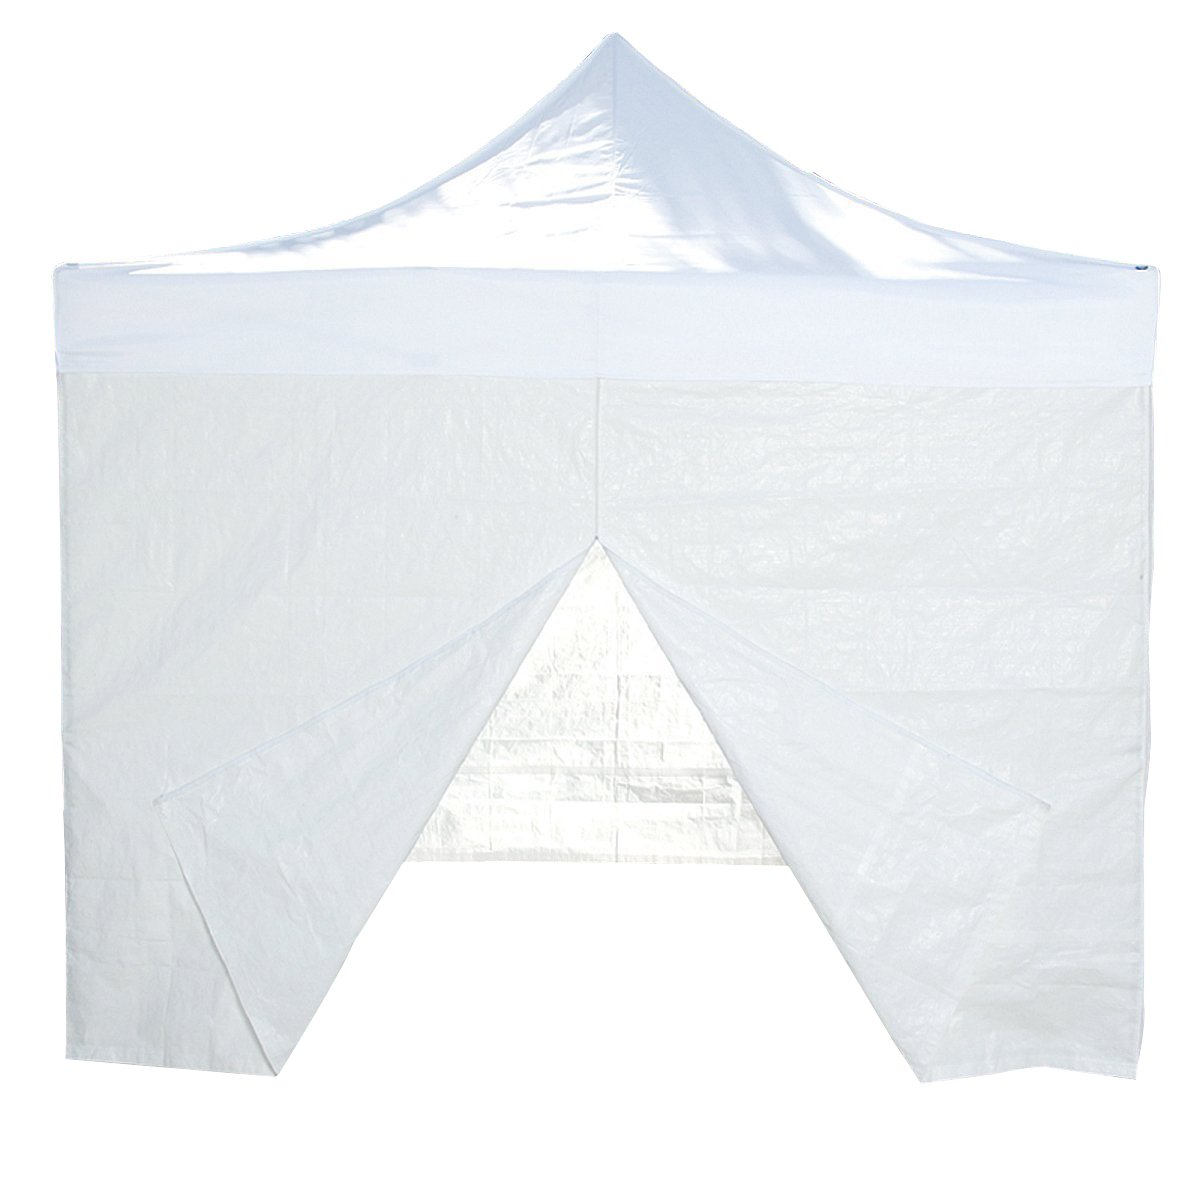 Sconto del 30% Qisan baldacchino tenda Sidewall kit 10 x 10 piedi, bianco (4 pz)